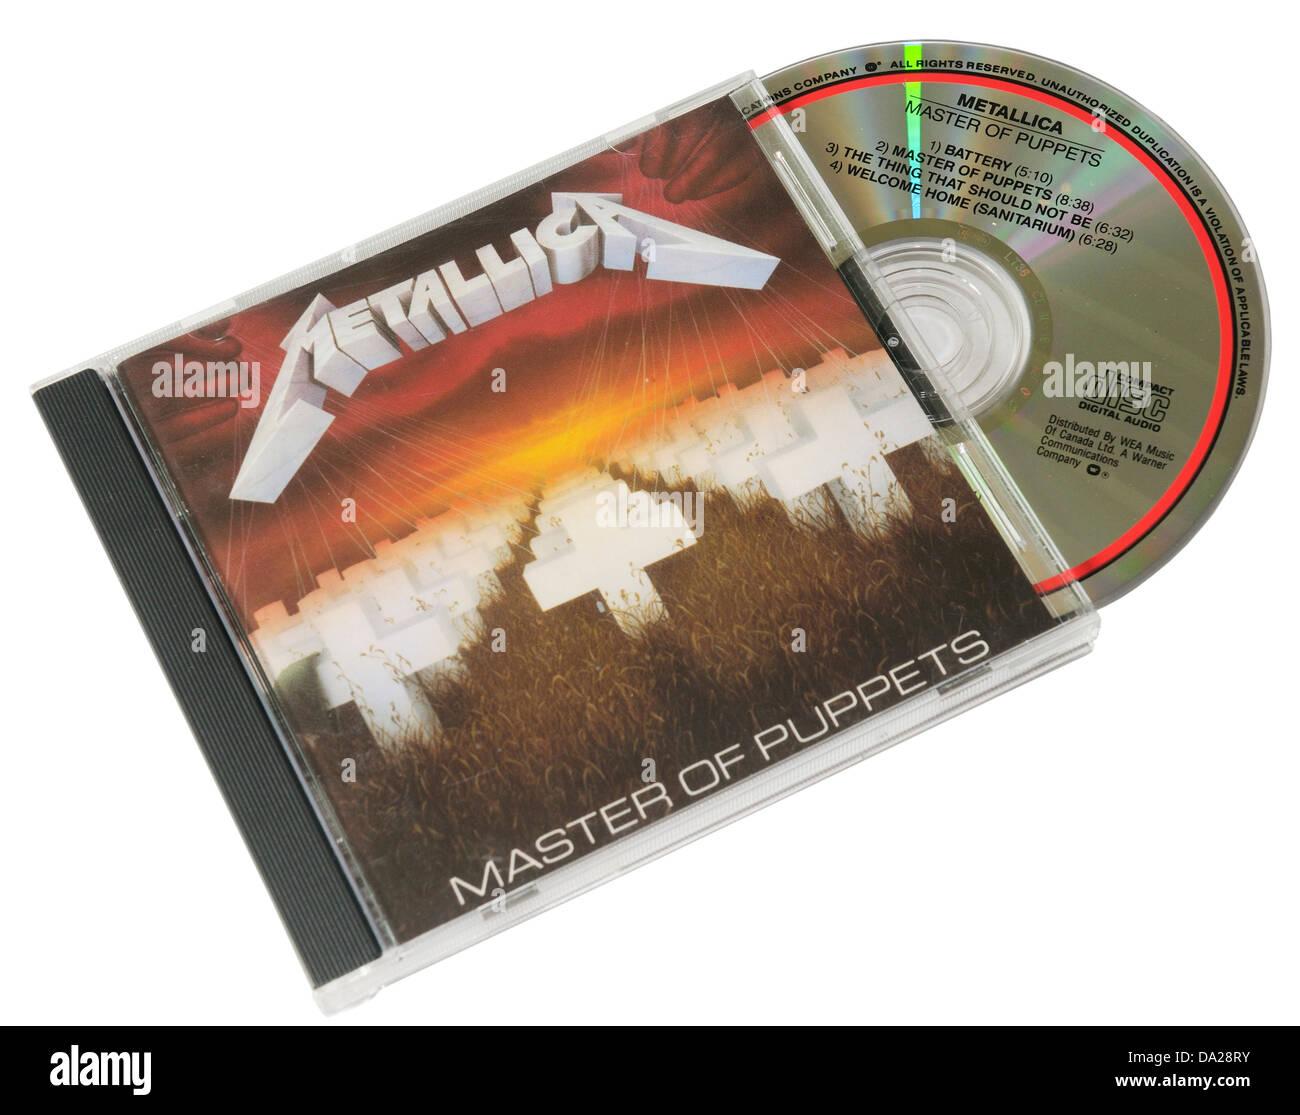 Metallica Master of Puppets album on CD - Stock Image